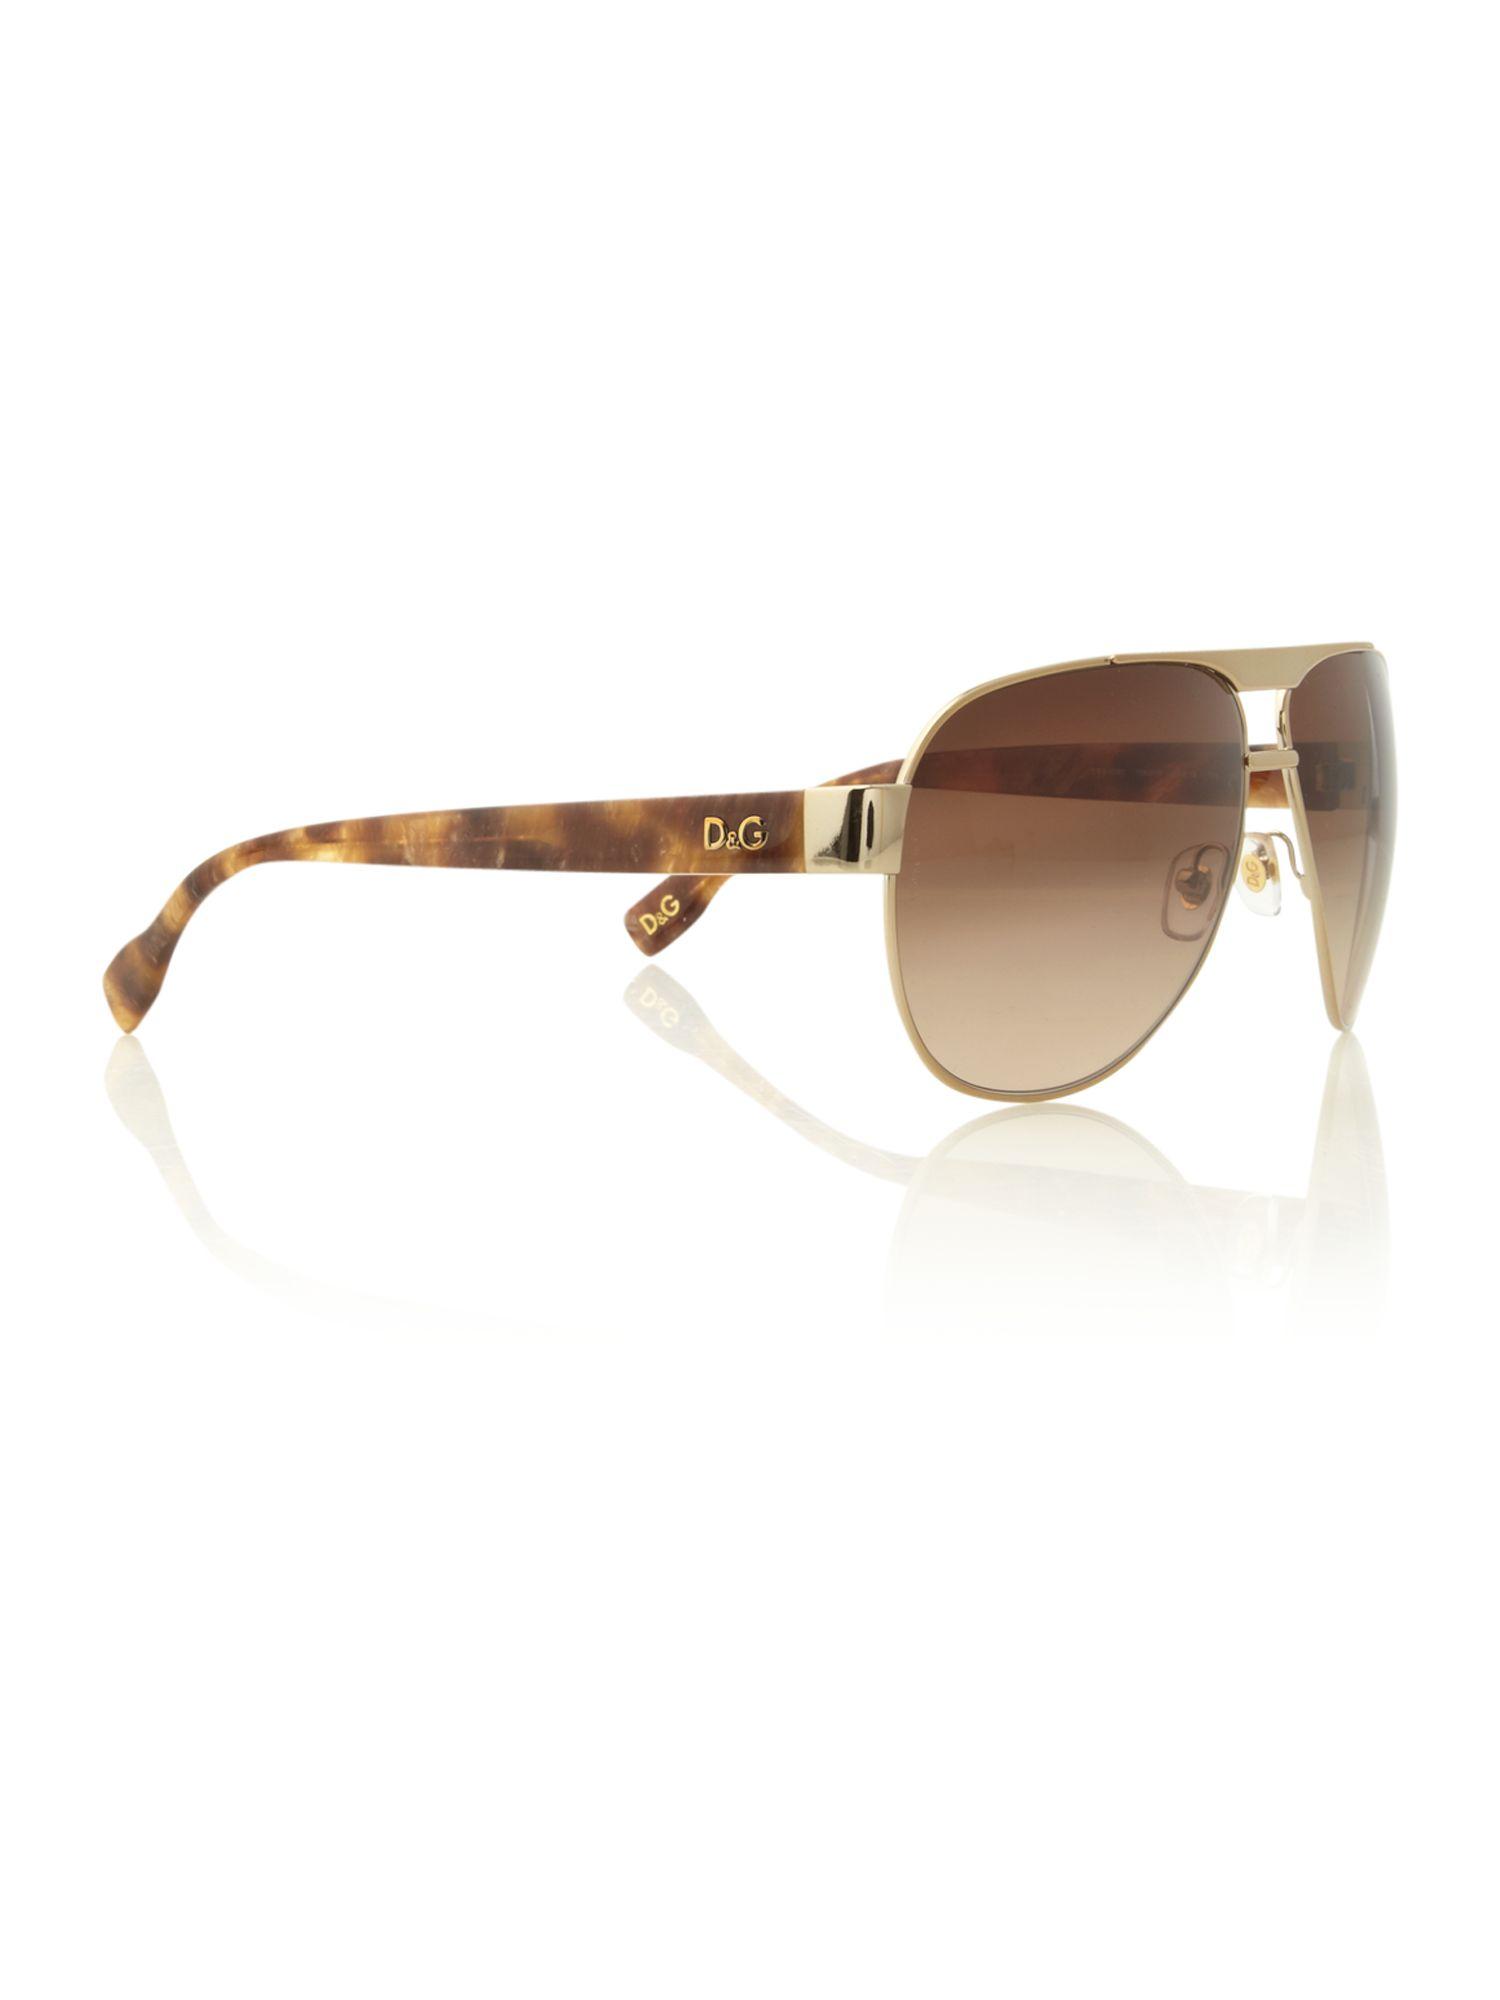 0f9f91fbd369 D g Mens Aviator Sunglasses